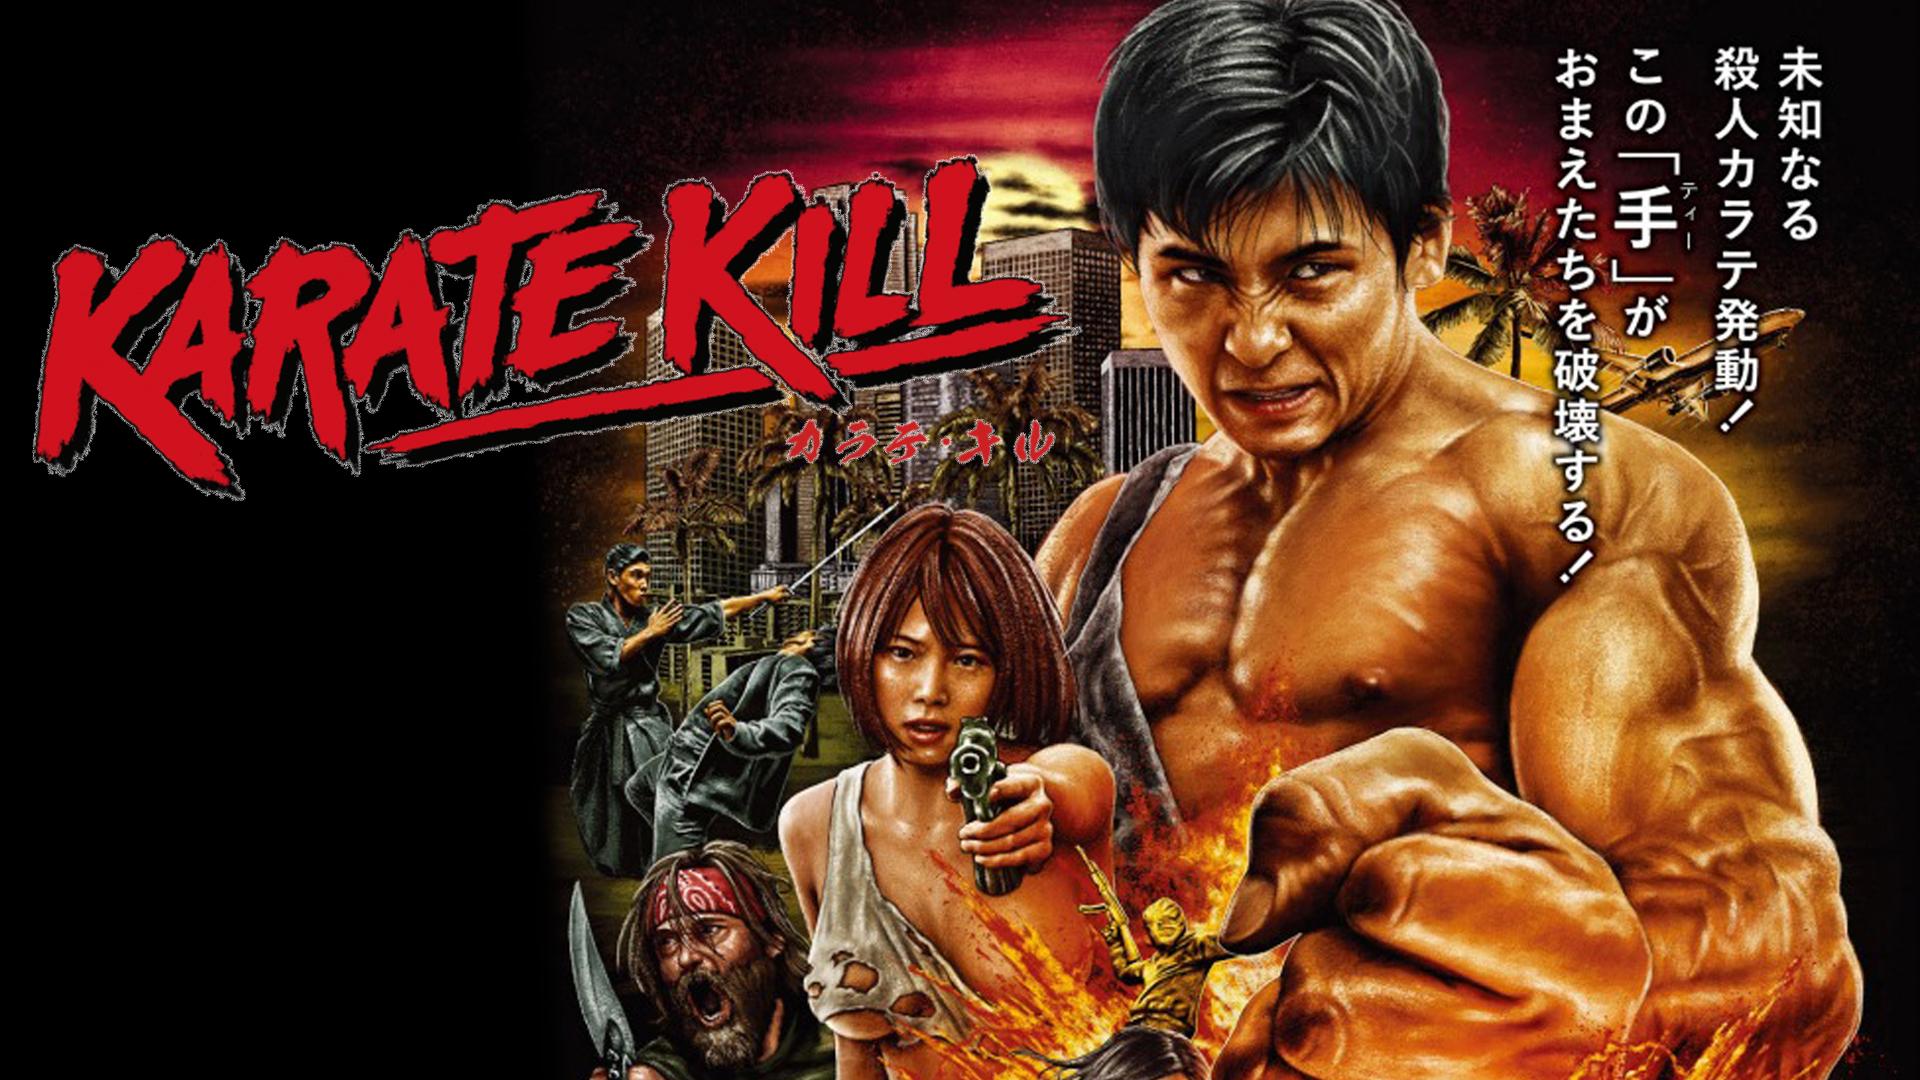 Karate Kill カラテ・キル